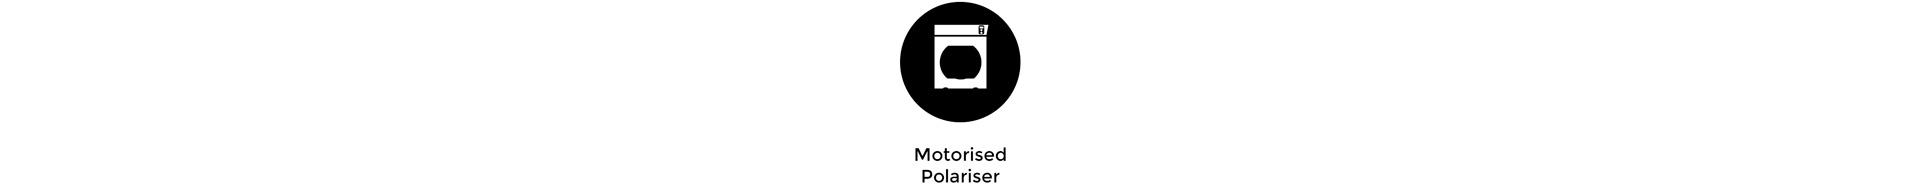 Cinefade Application standalone Motorised polariser